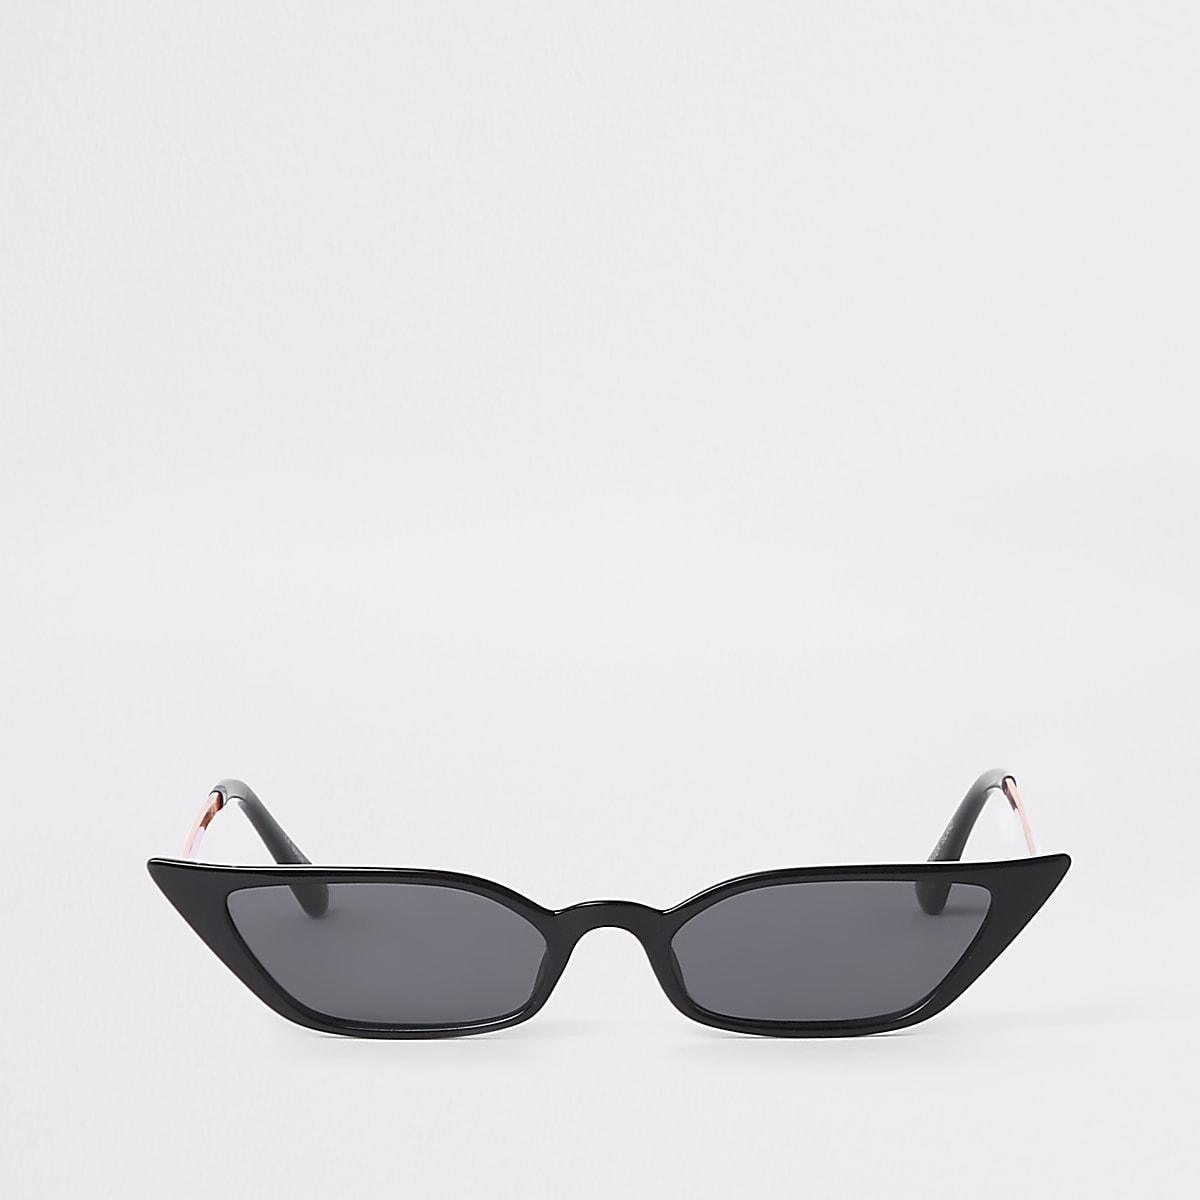 3cbba587e3836 Black super slim frame pointed sunglasses - Cat Eye Sunglasses - Sunglasses  - women